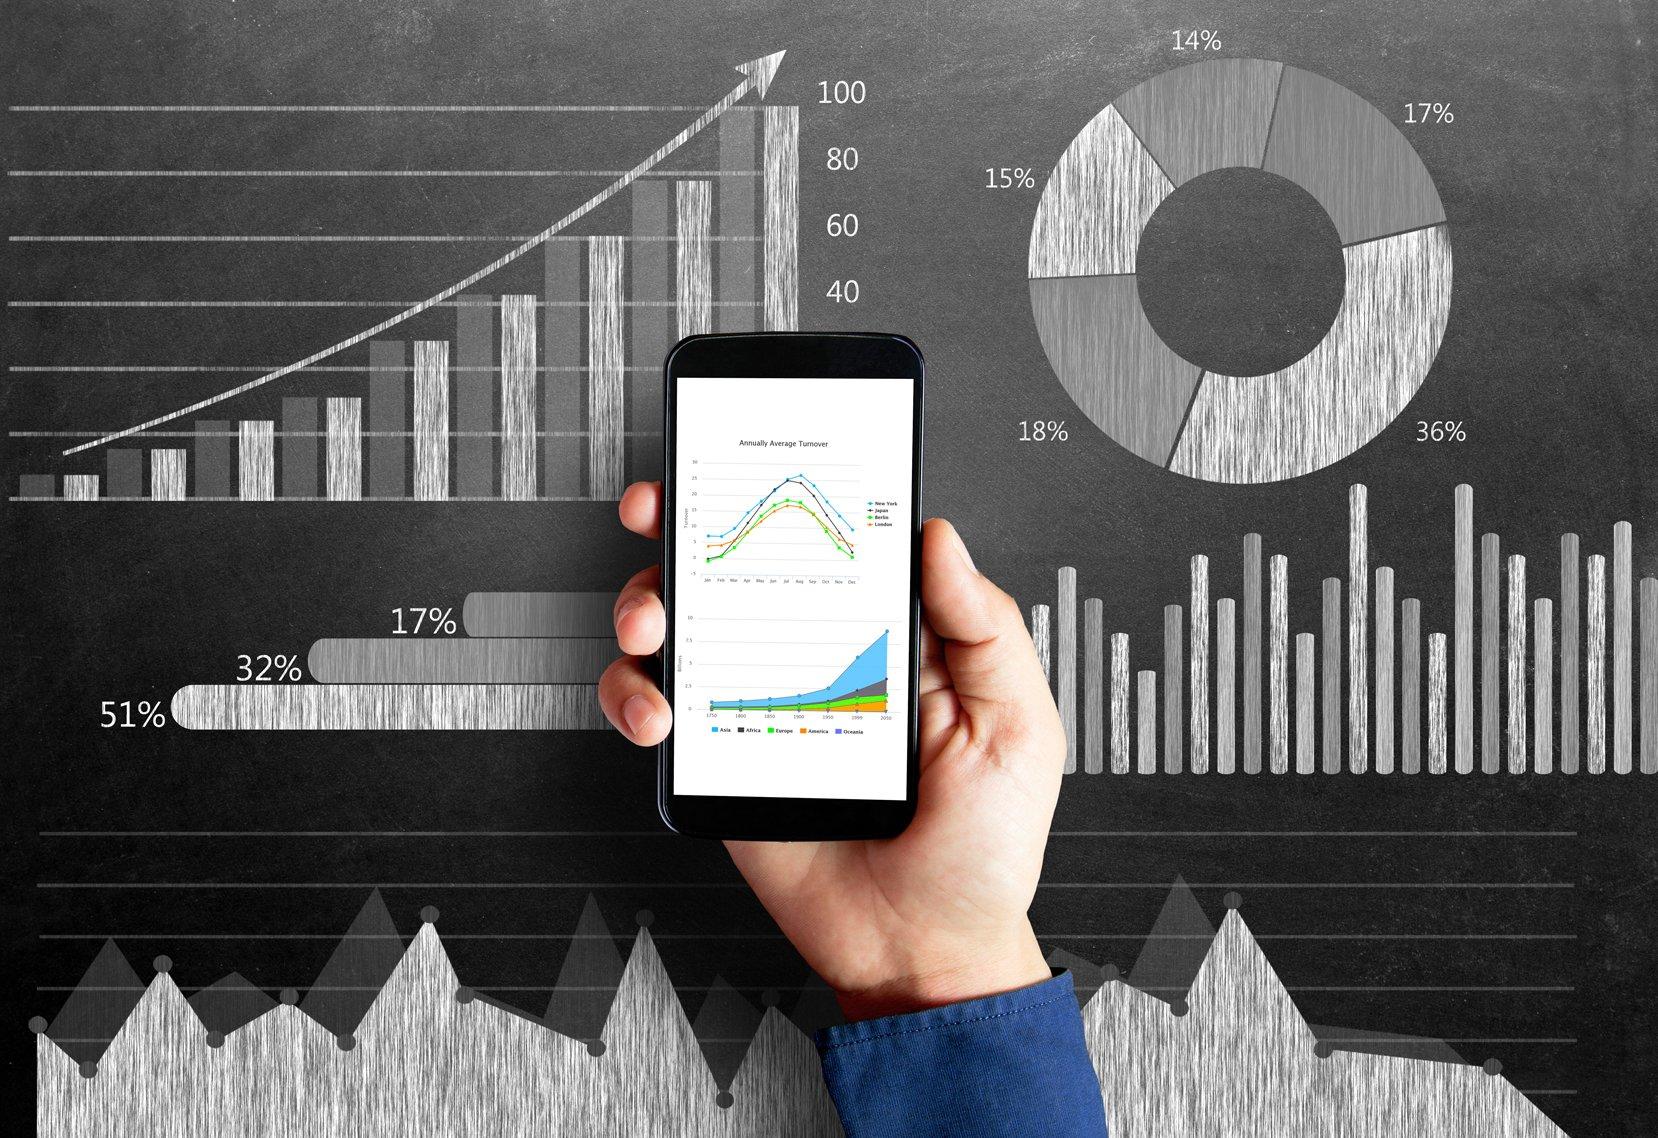 Integrated marketing communications plan